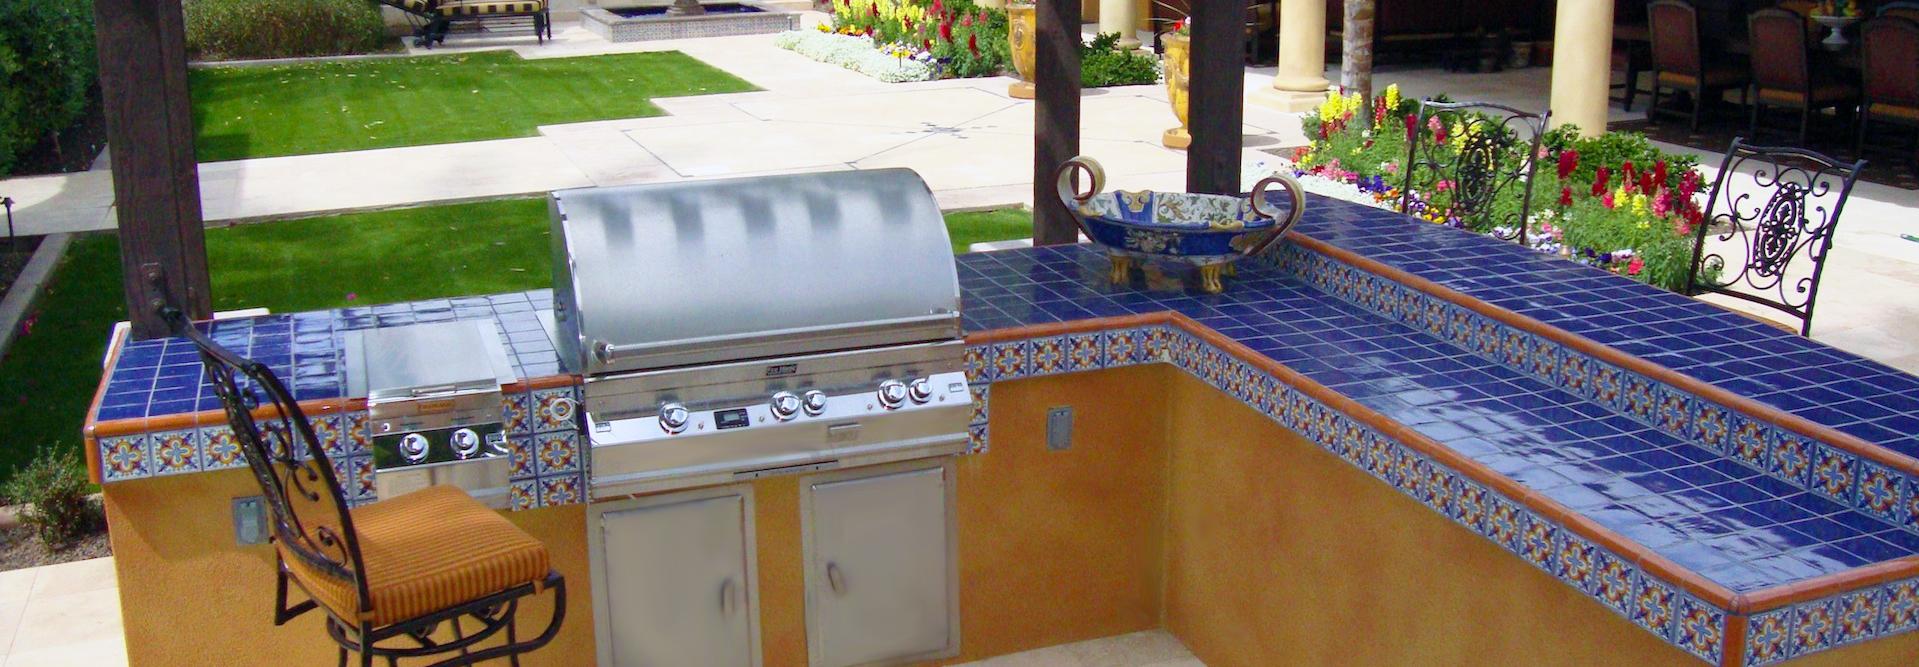 outdoor countertop ideas. top paving stone patio with outdoor